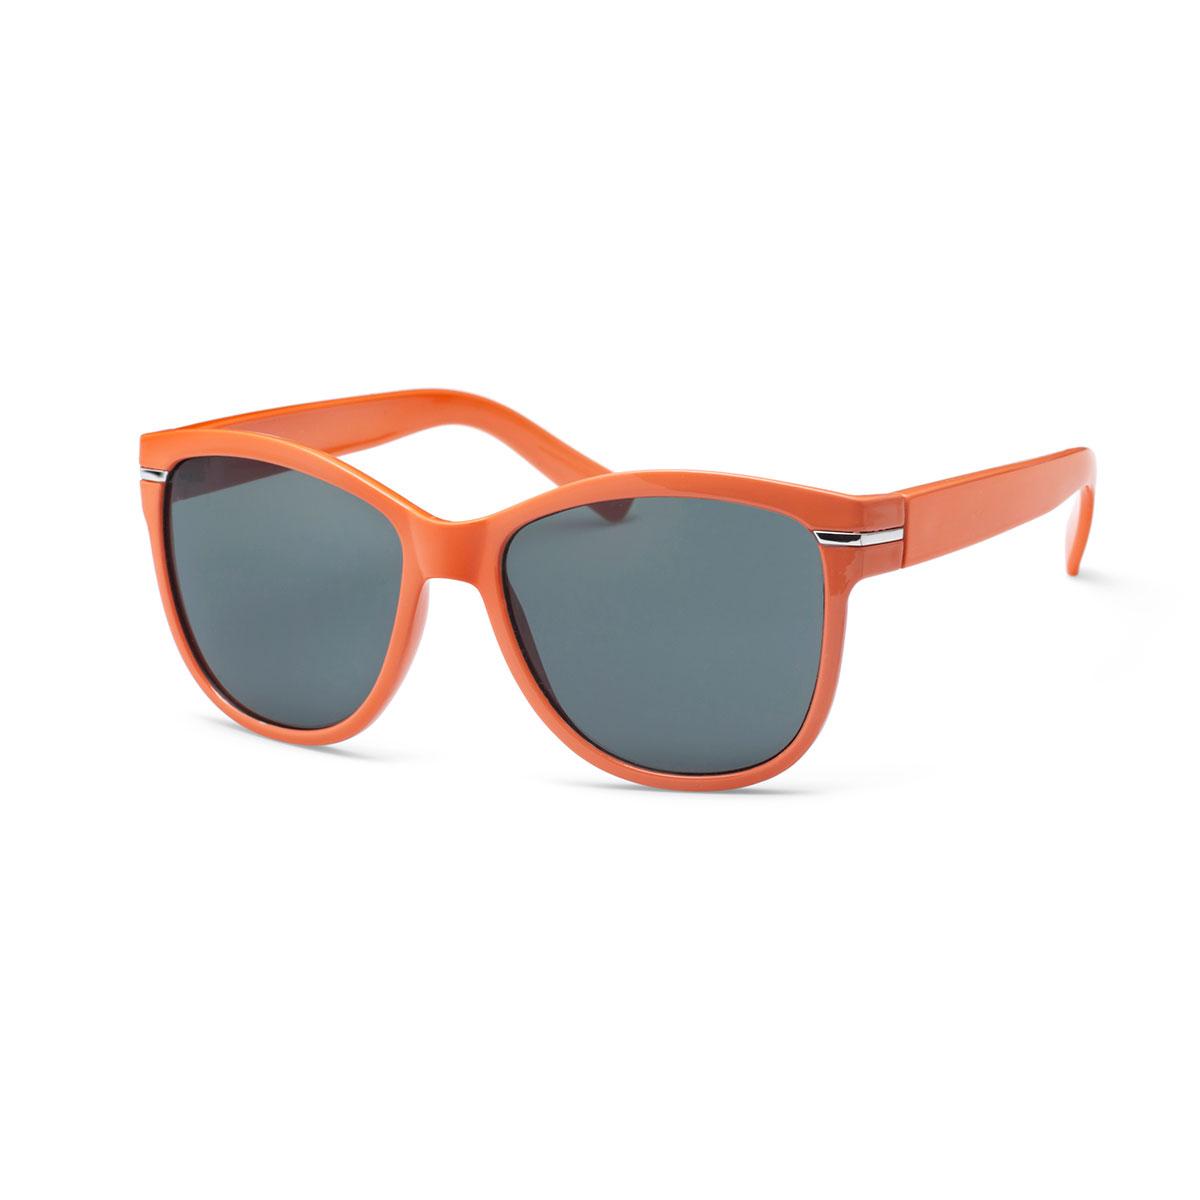 عینک نارنجی مدل فلوریدا